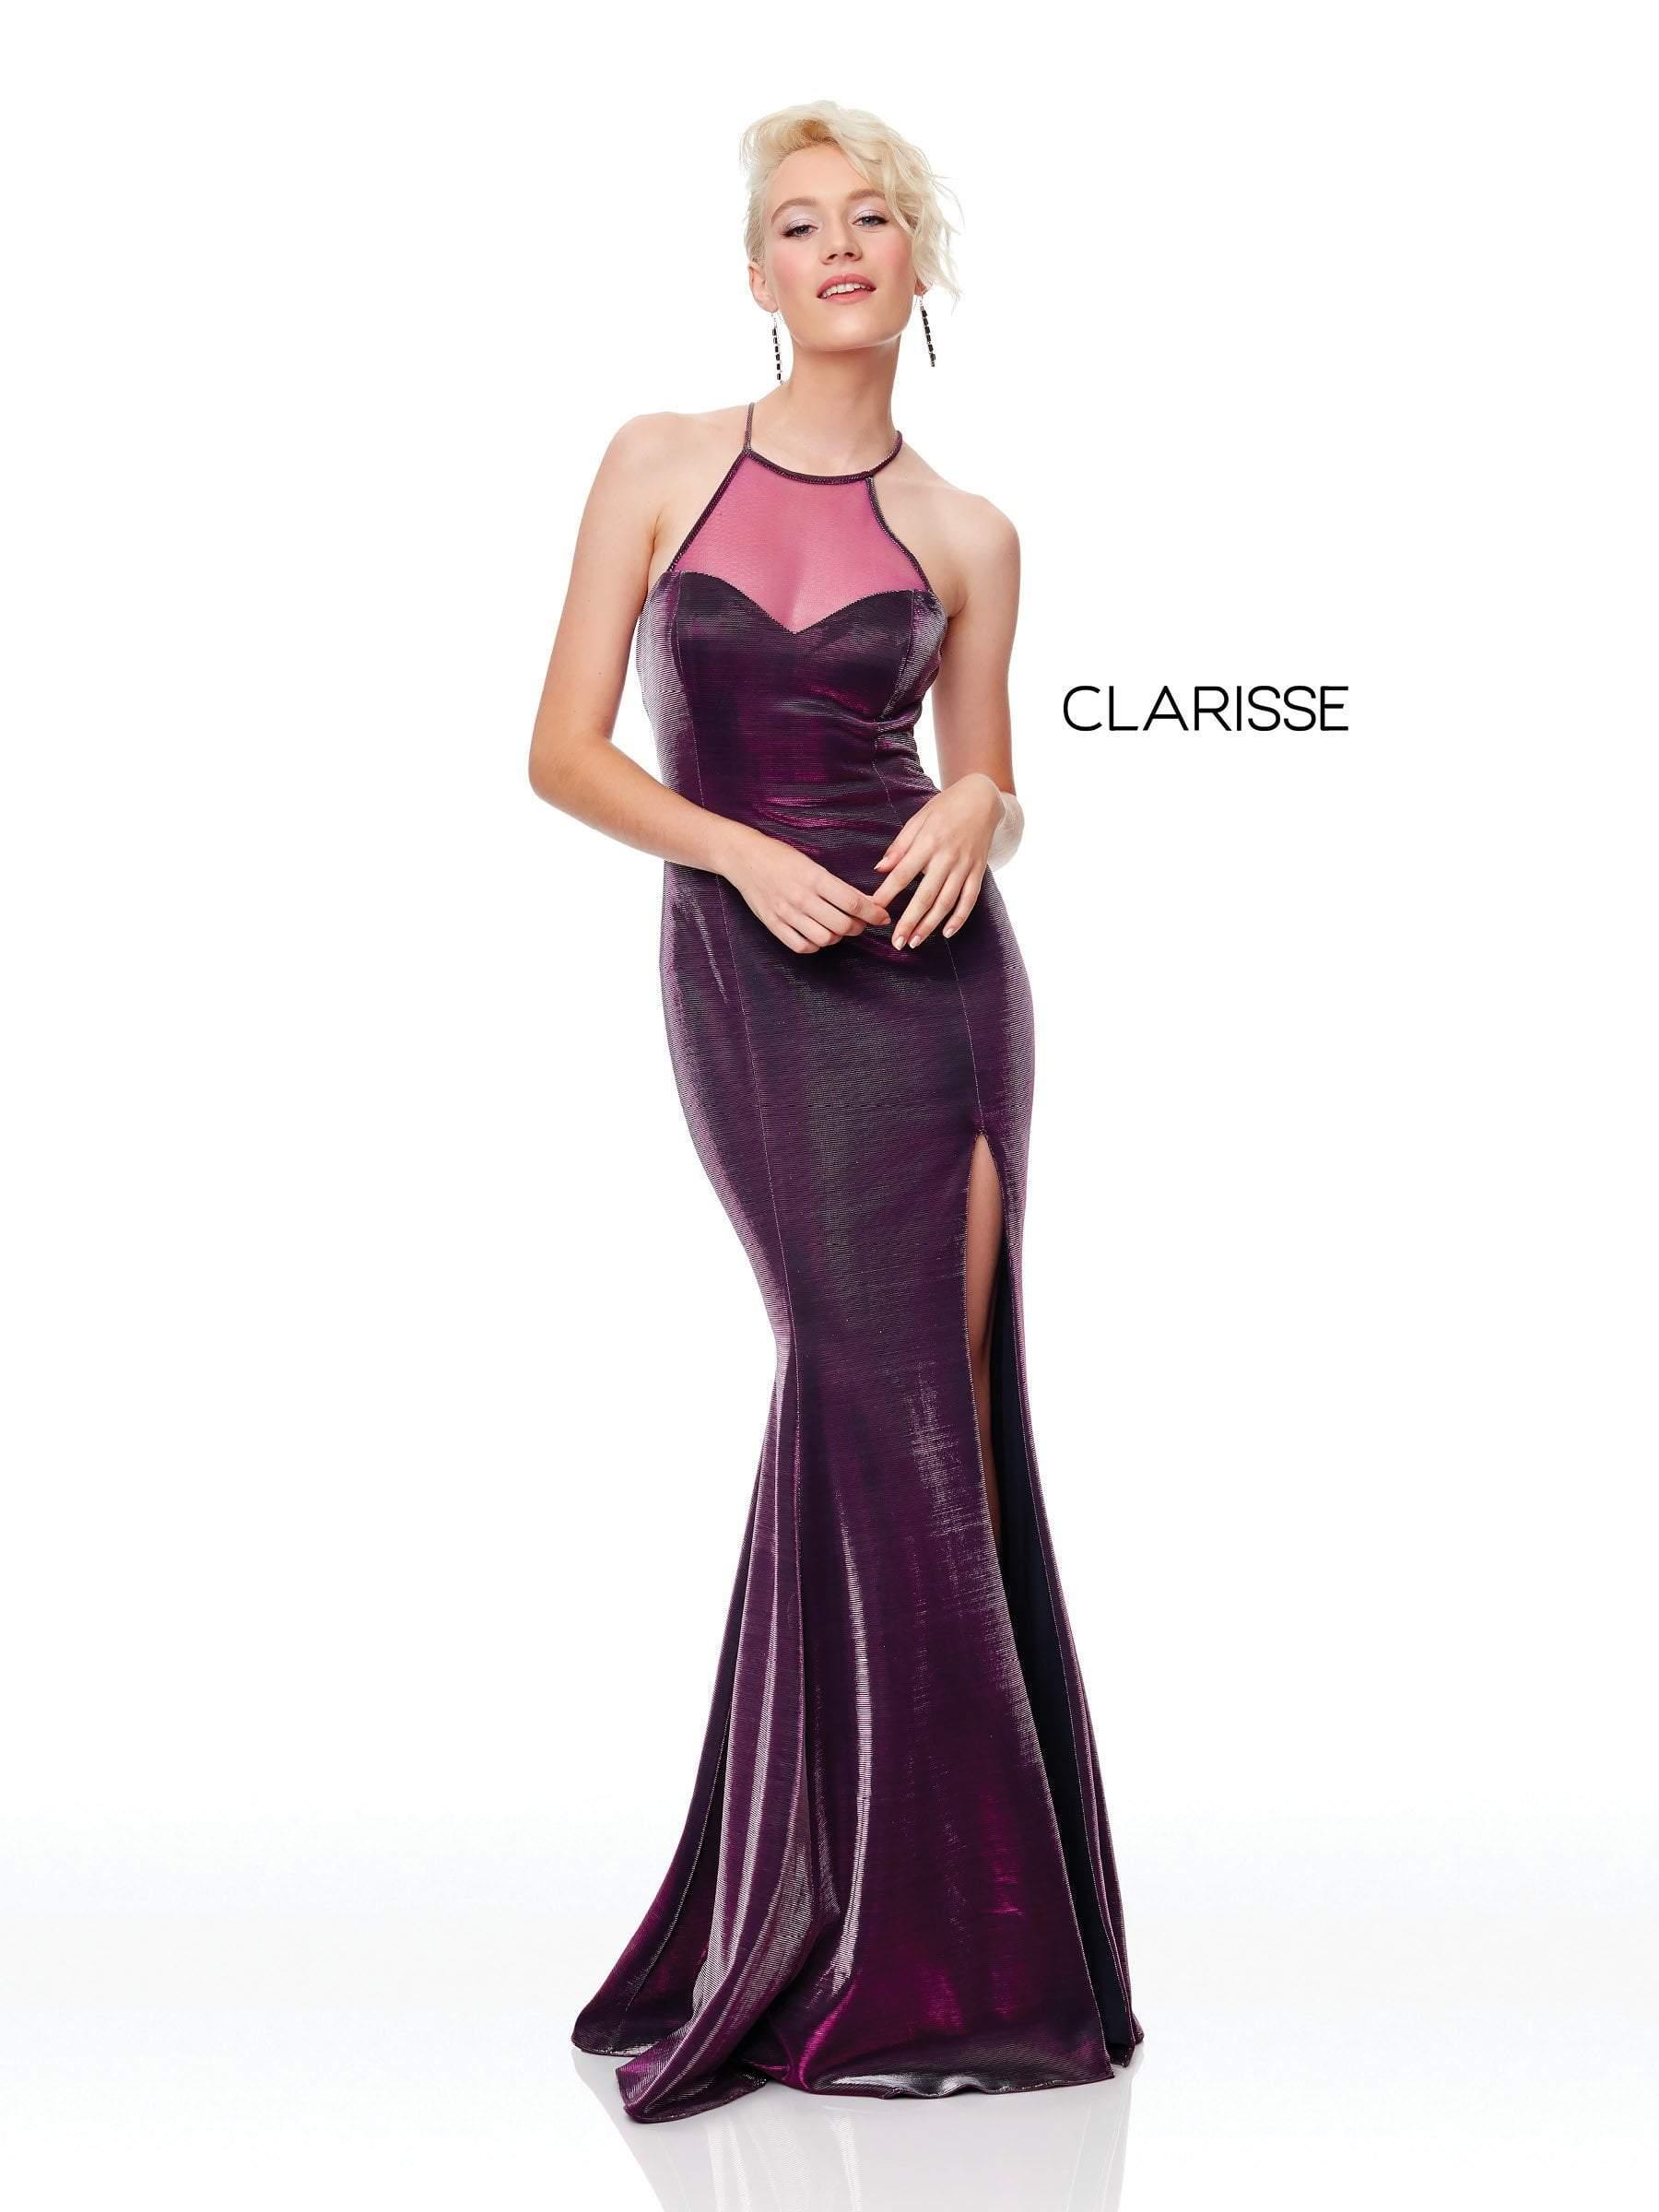 Clarisse - 3729 Sleeveless Halter Neck Trumpet Dress With Slit